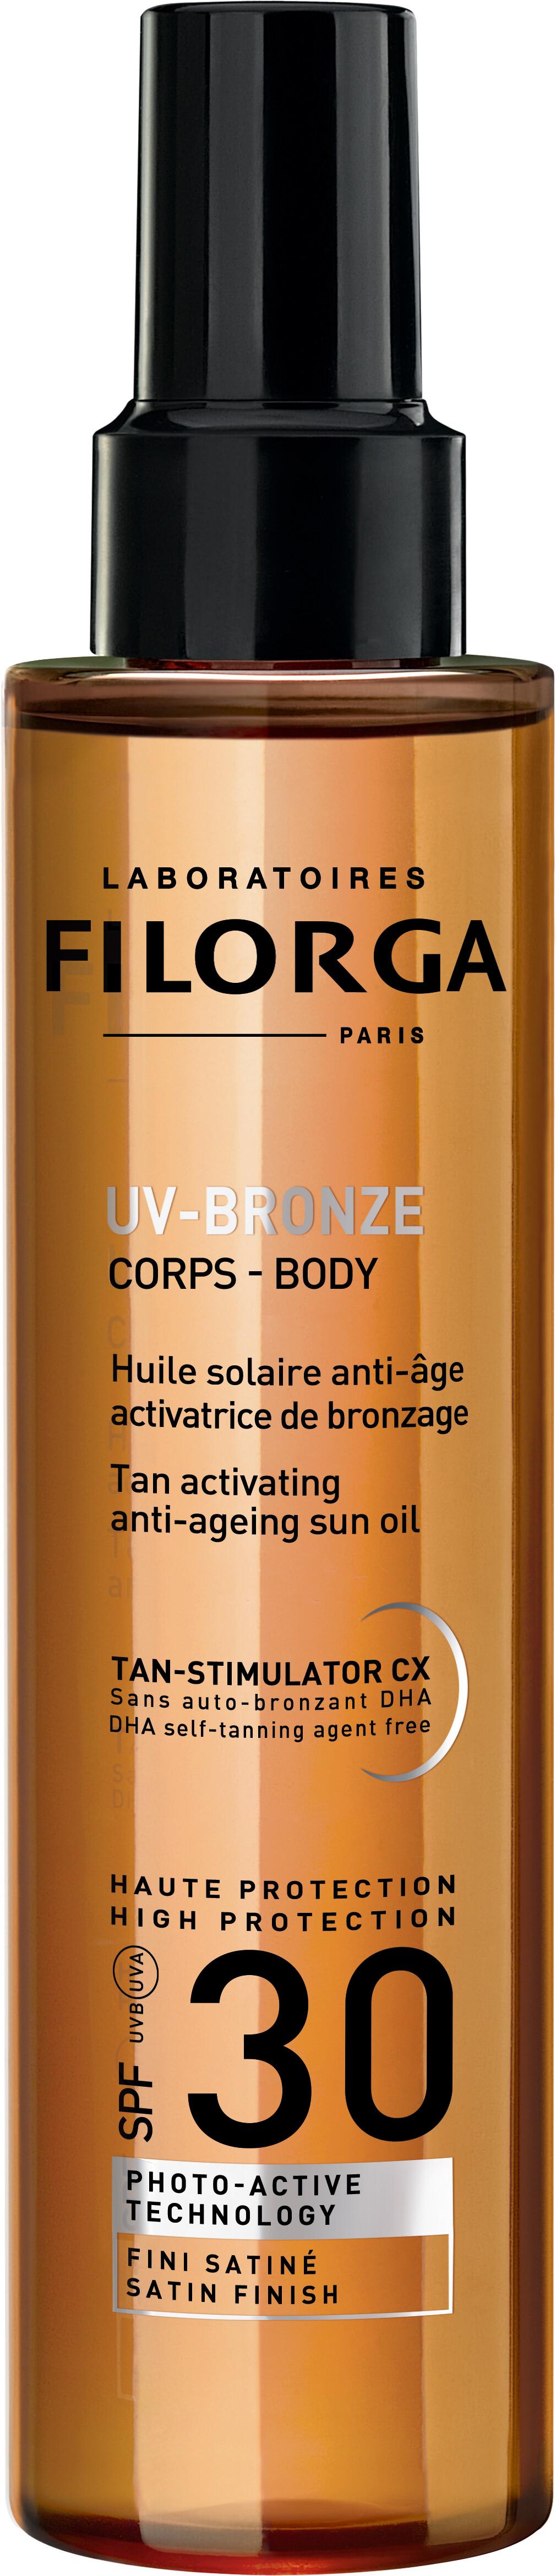 Filorga UV Bronze Body Tan Activating Anti-Ageing Sun Oil SPF30 150ml